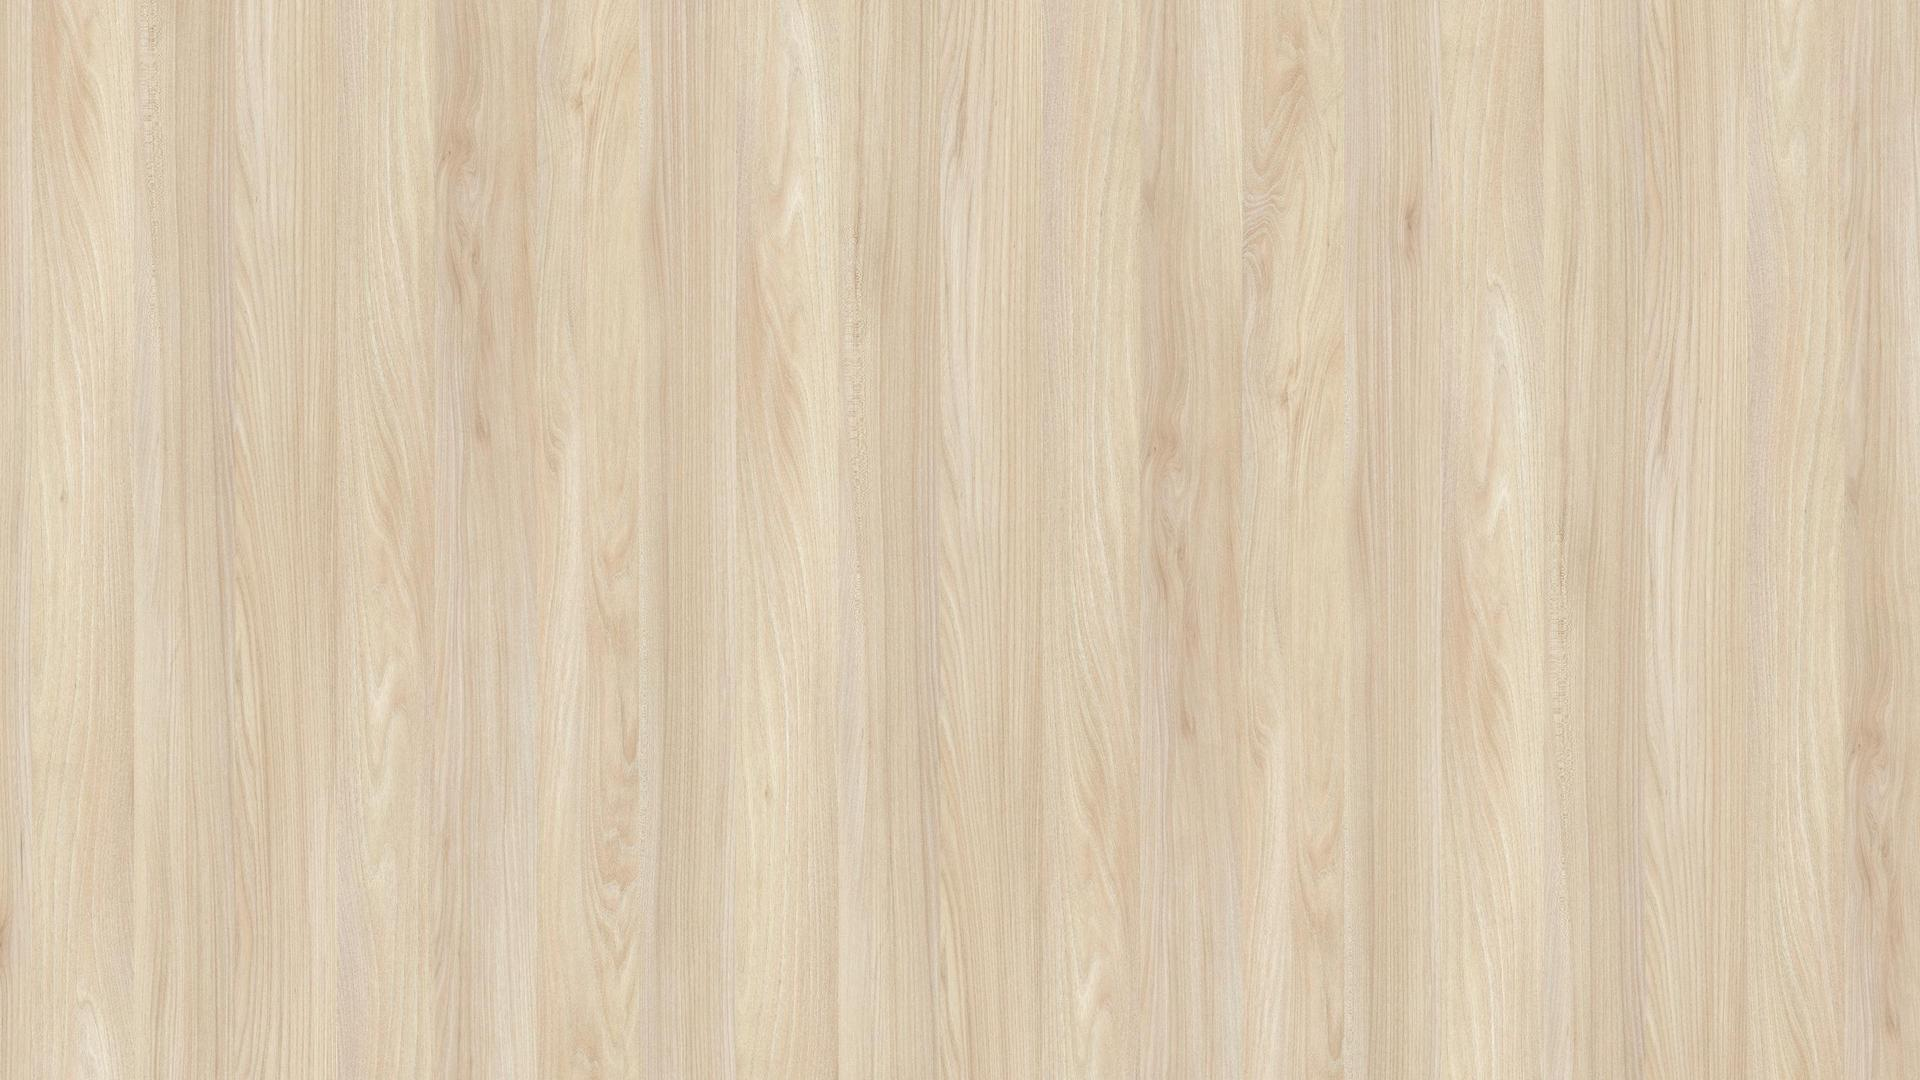 PAL Melaminat Ultra Mat Frasin Hochland 37769 SU BS Kaindl Decor 2